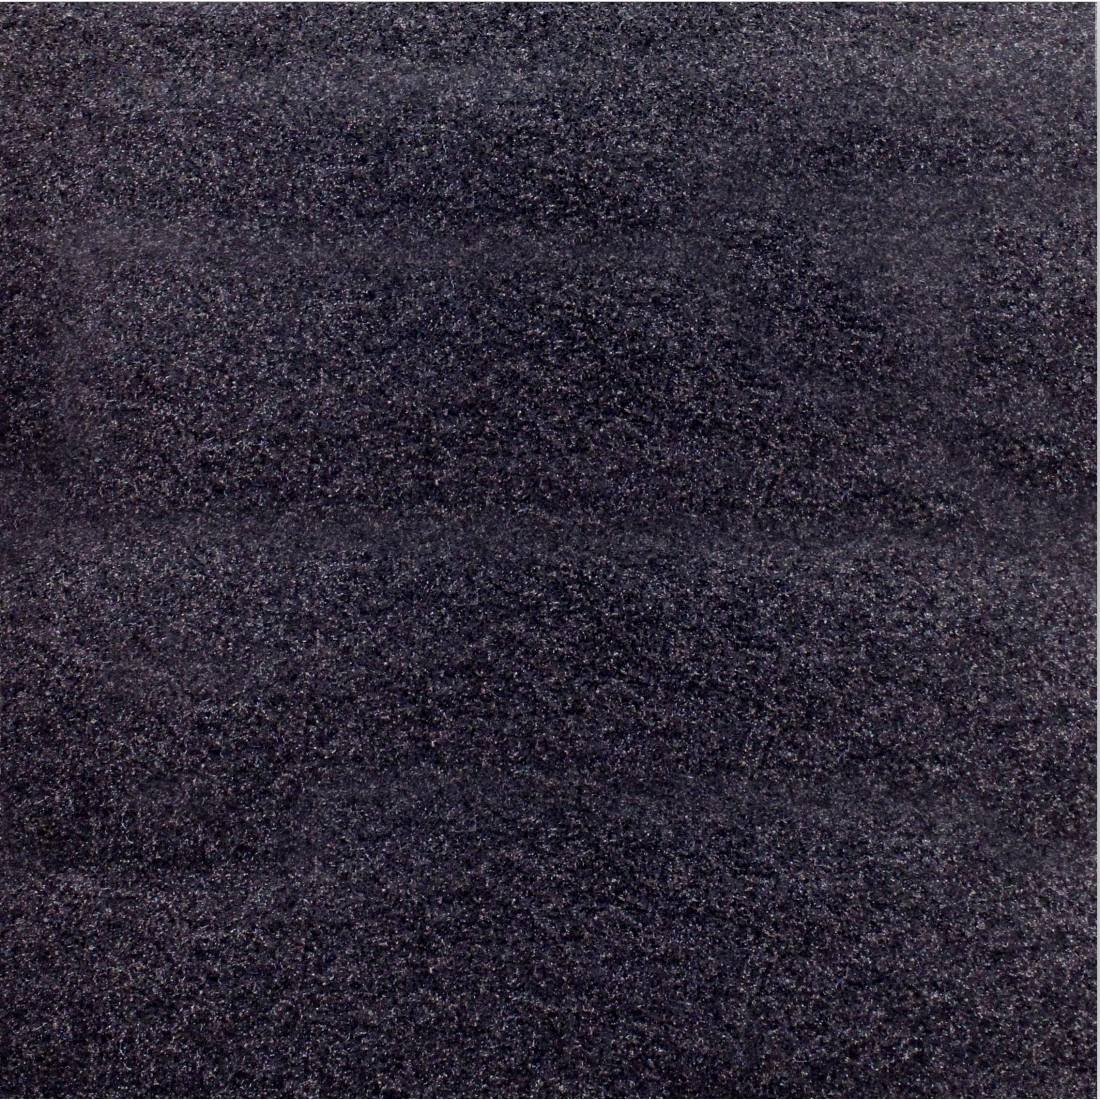 Evolution Black 60x60 Black 1